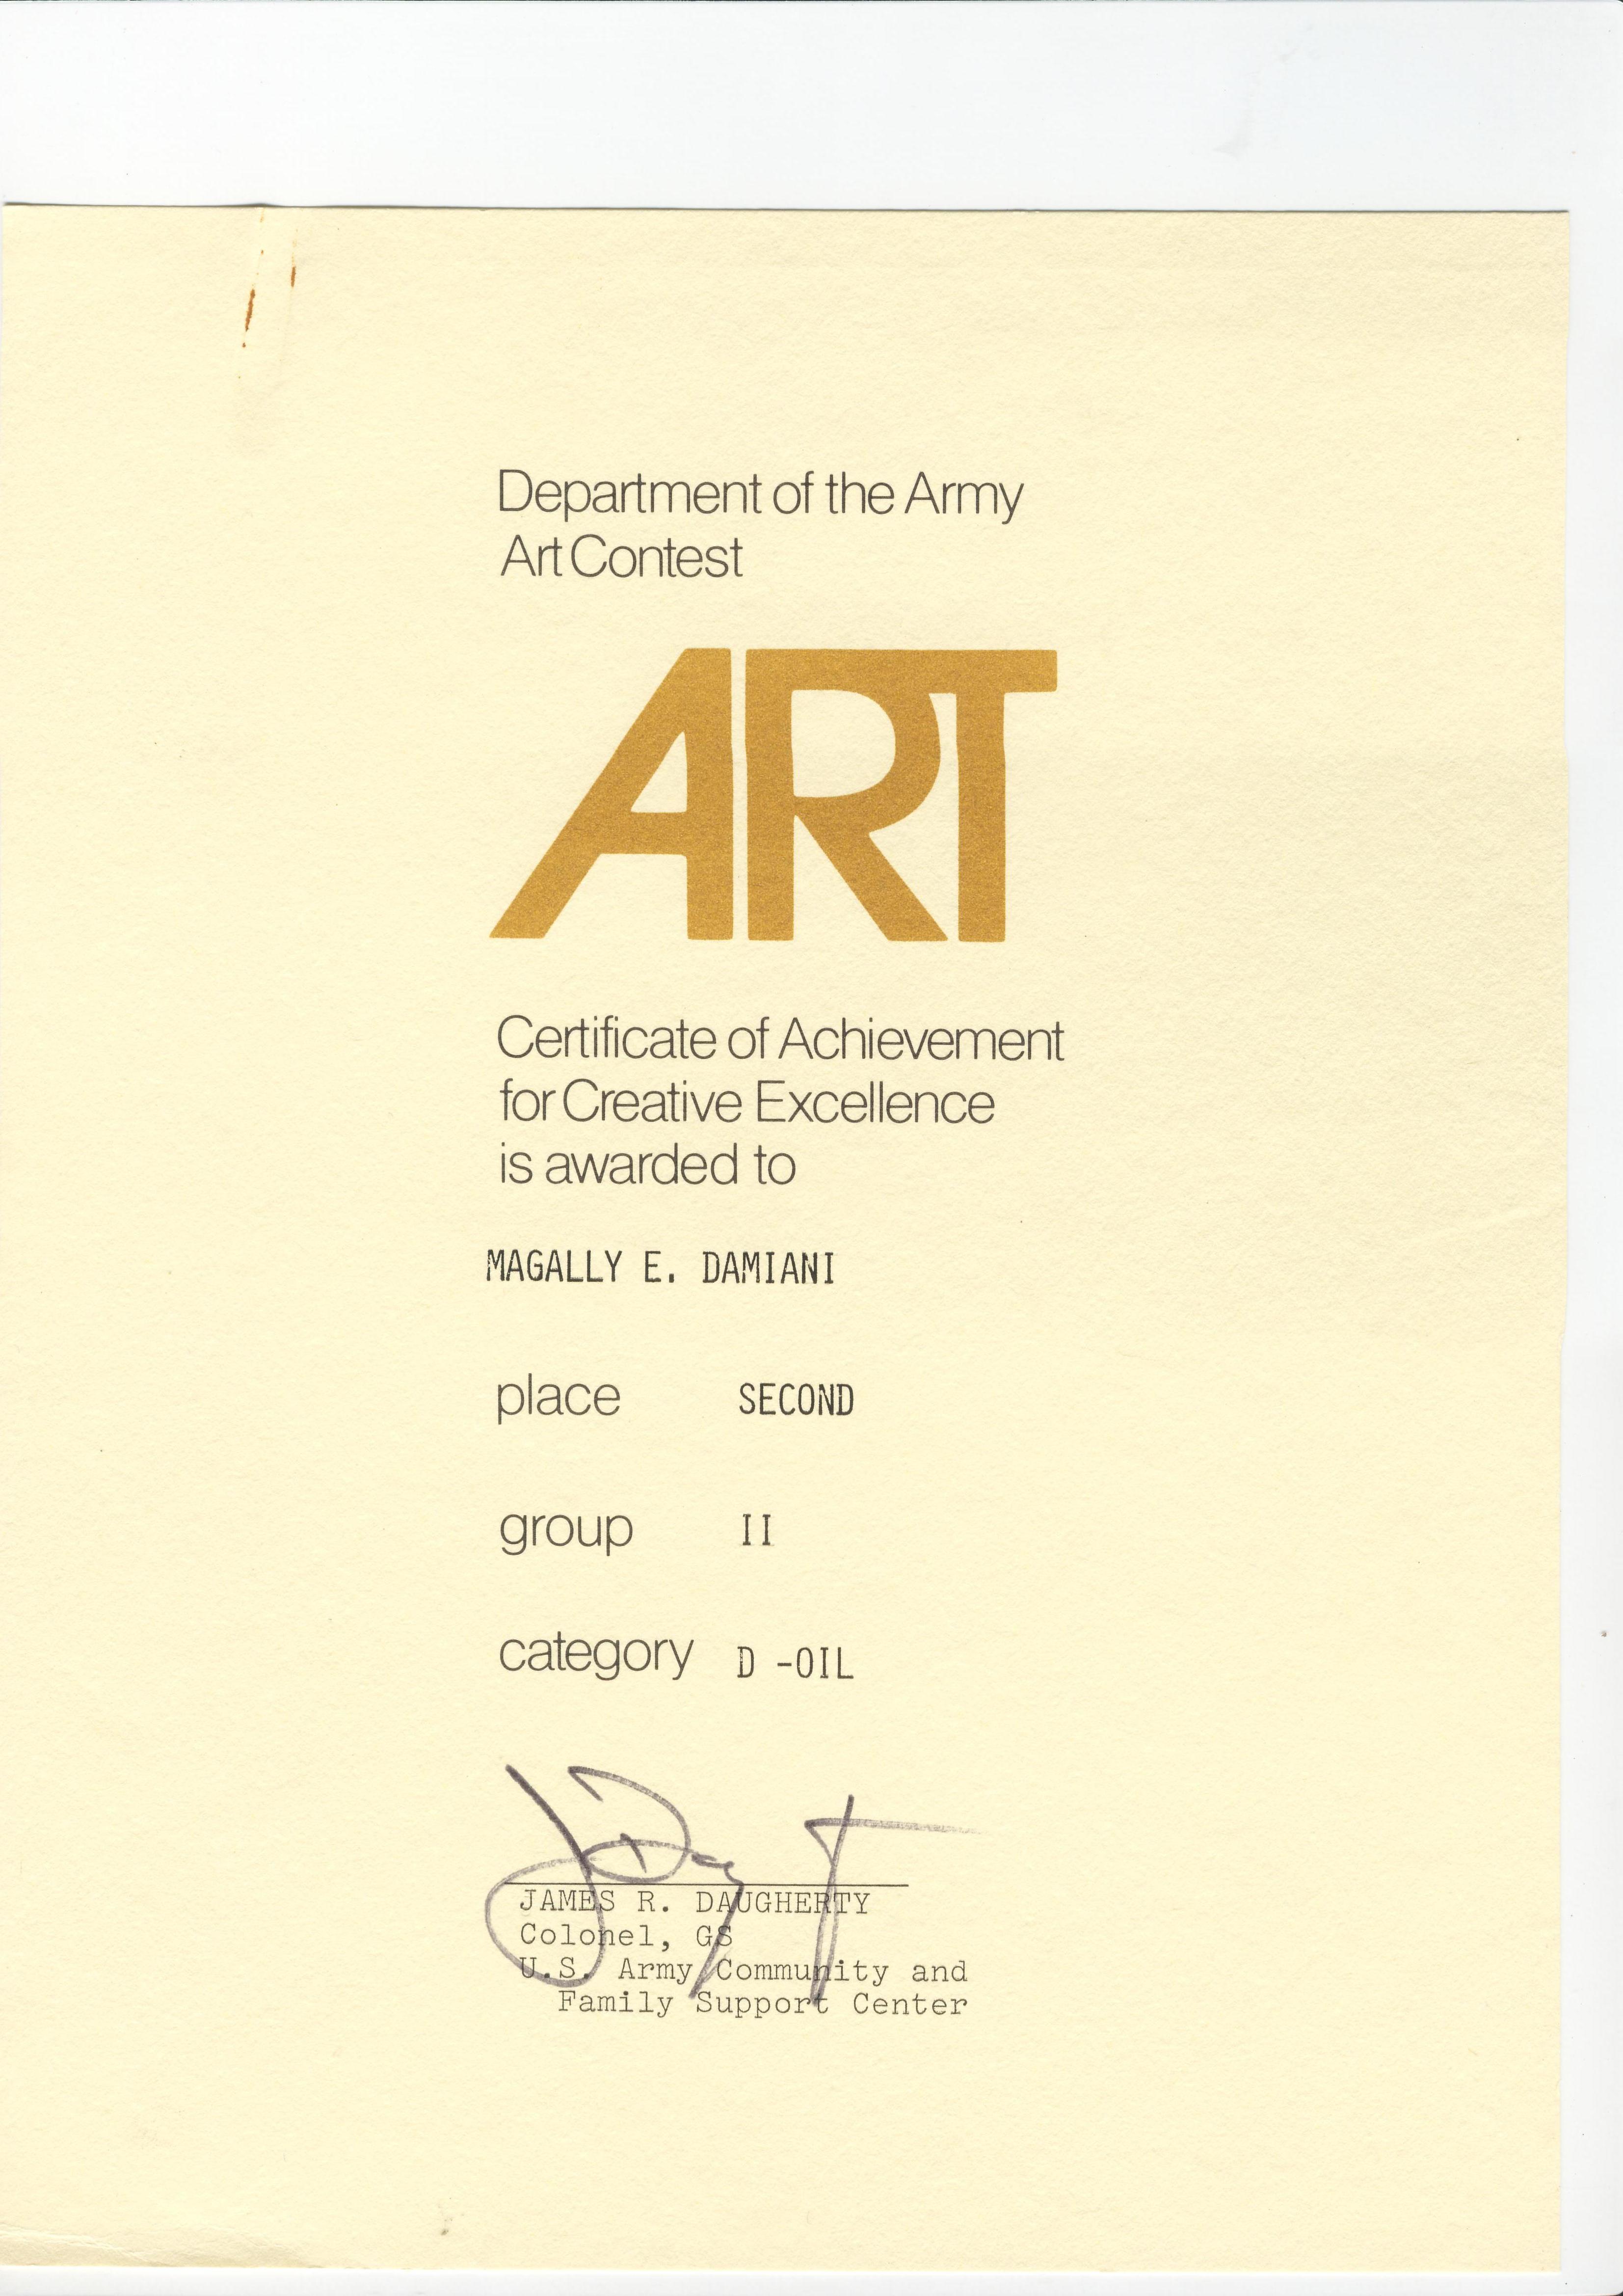 Diploma ART Contest.JPG